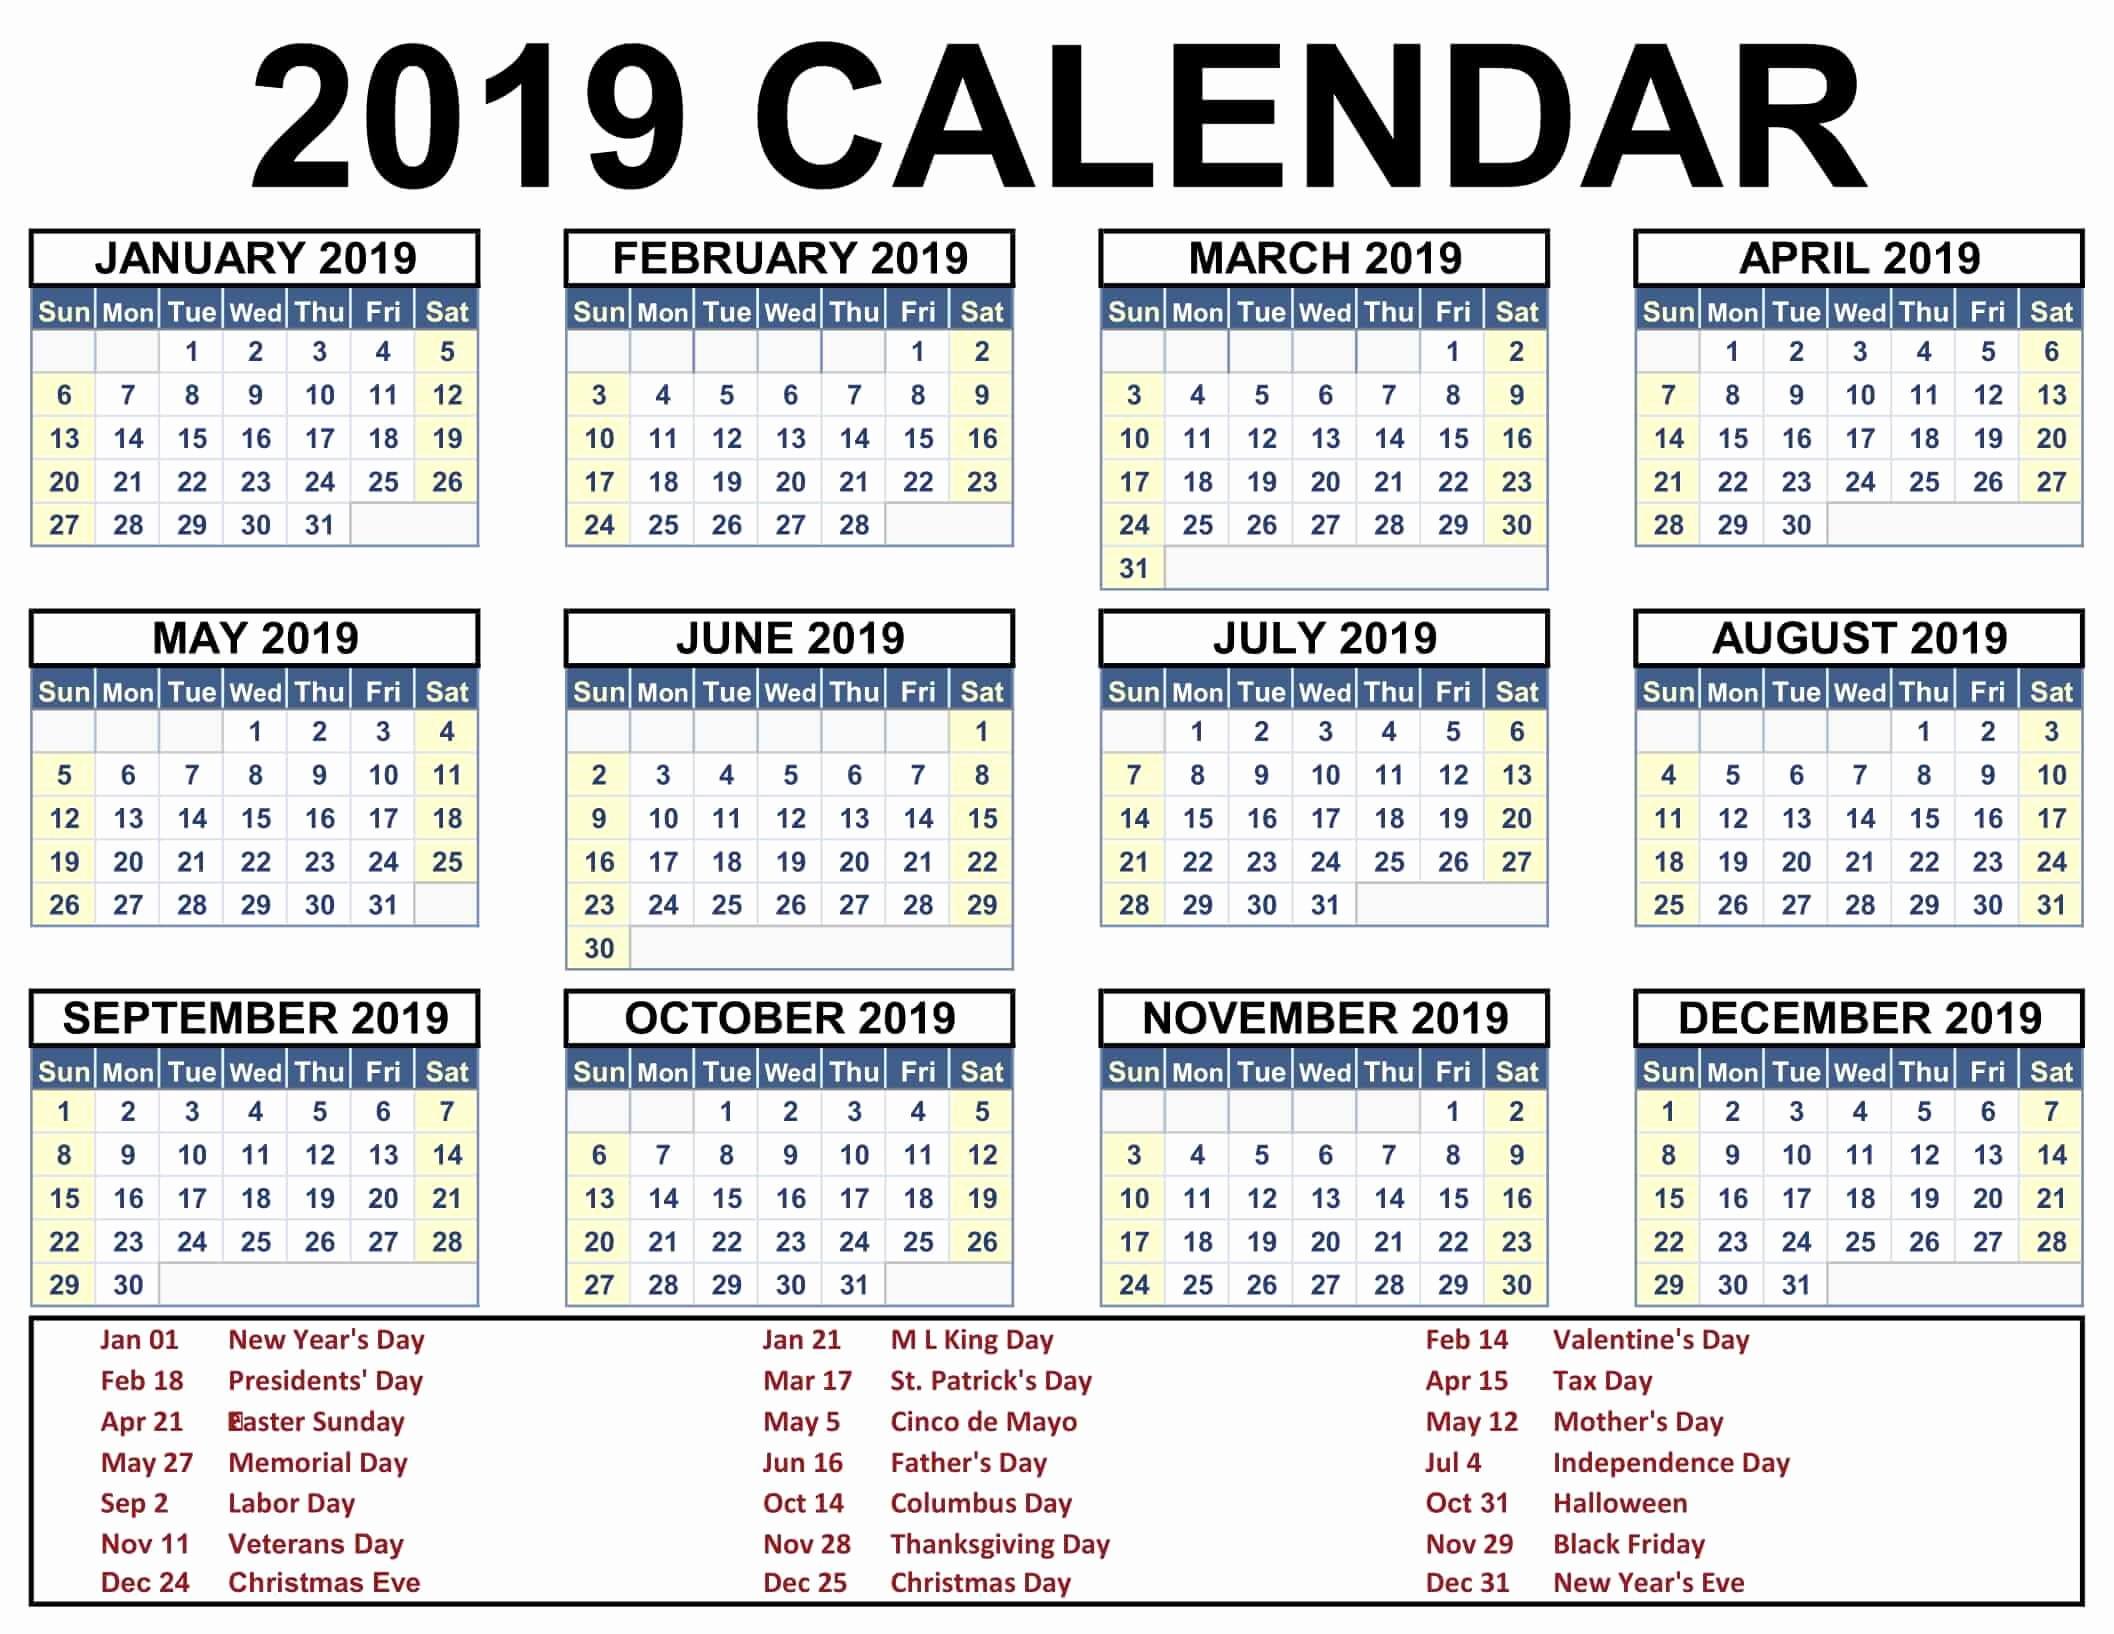 Printable 2018 and 2019 Calendar Lovely 2019 Calendar Holidays Usa India Uk Canada Australia